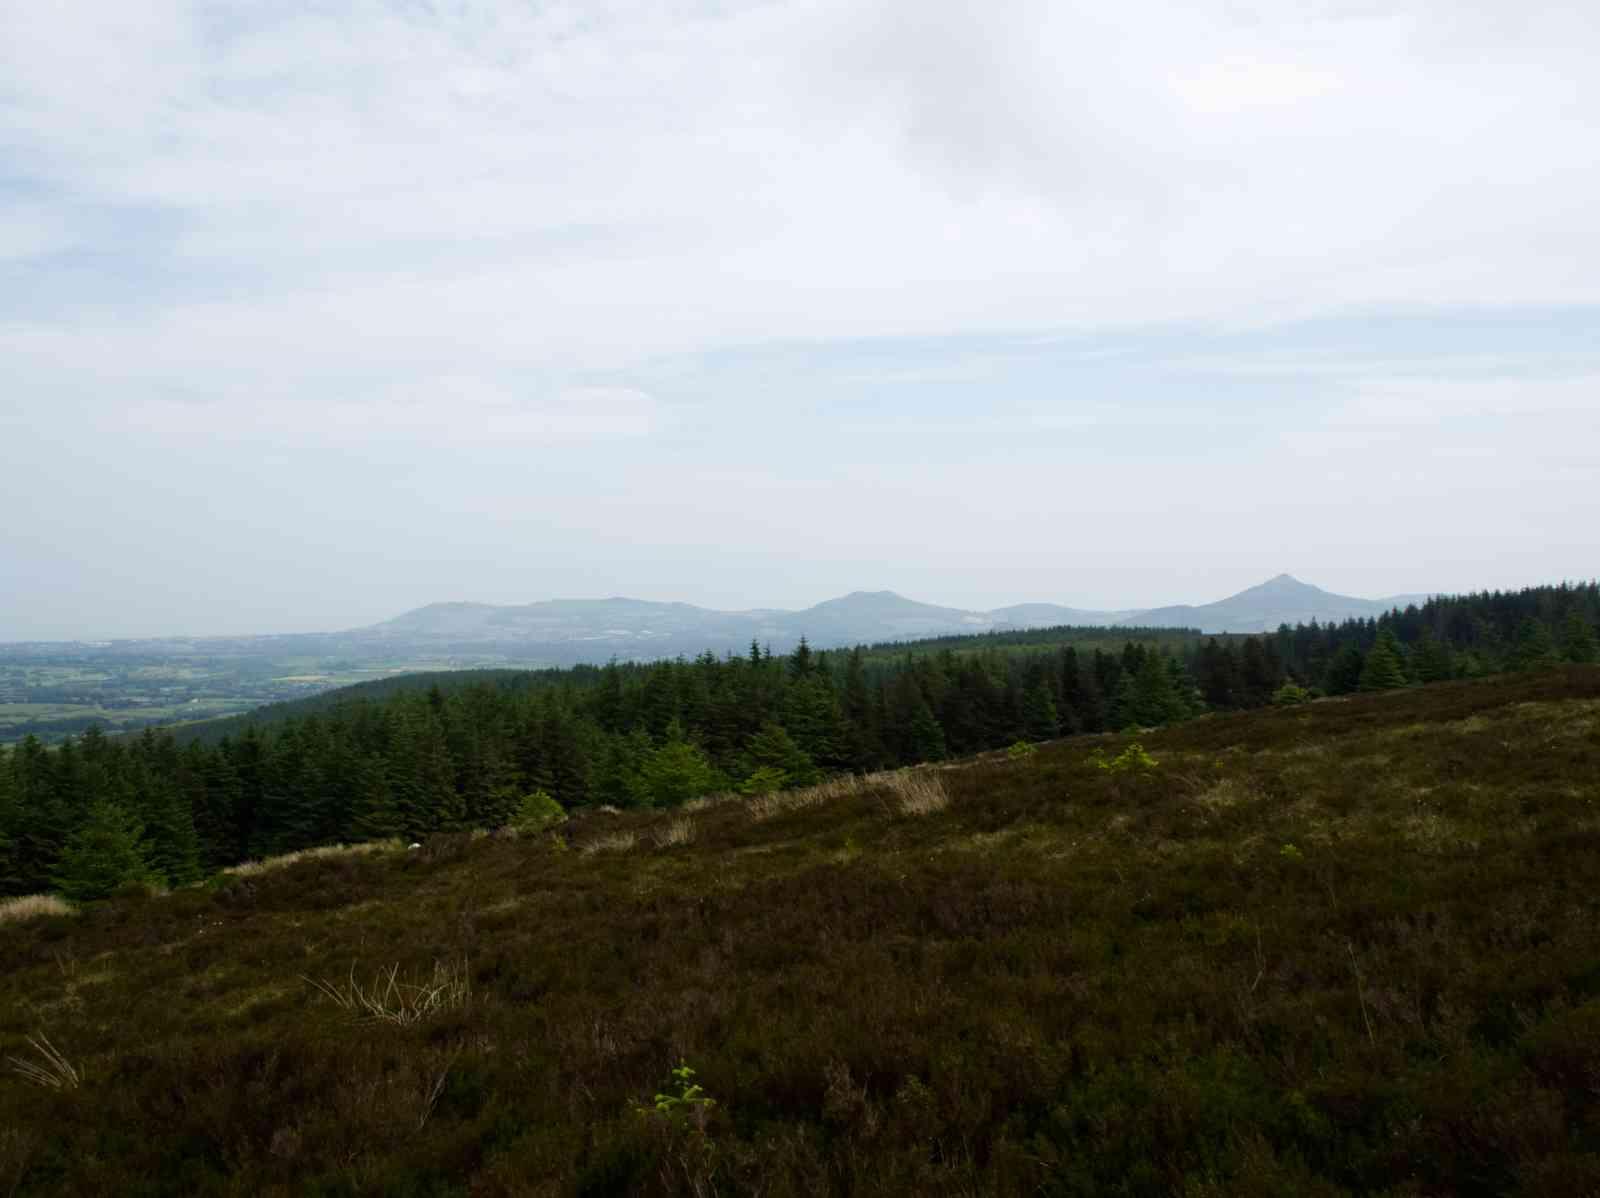 Prince William's Seat - Blick vom Gipfel